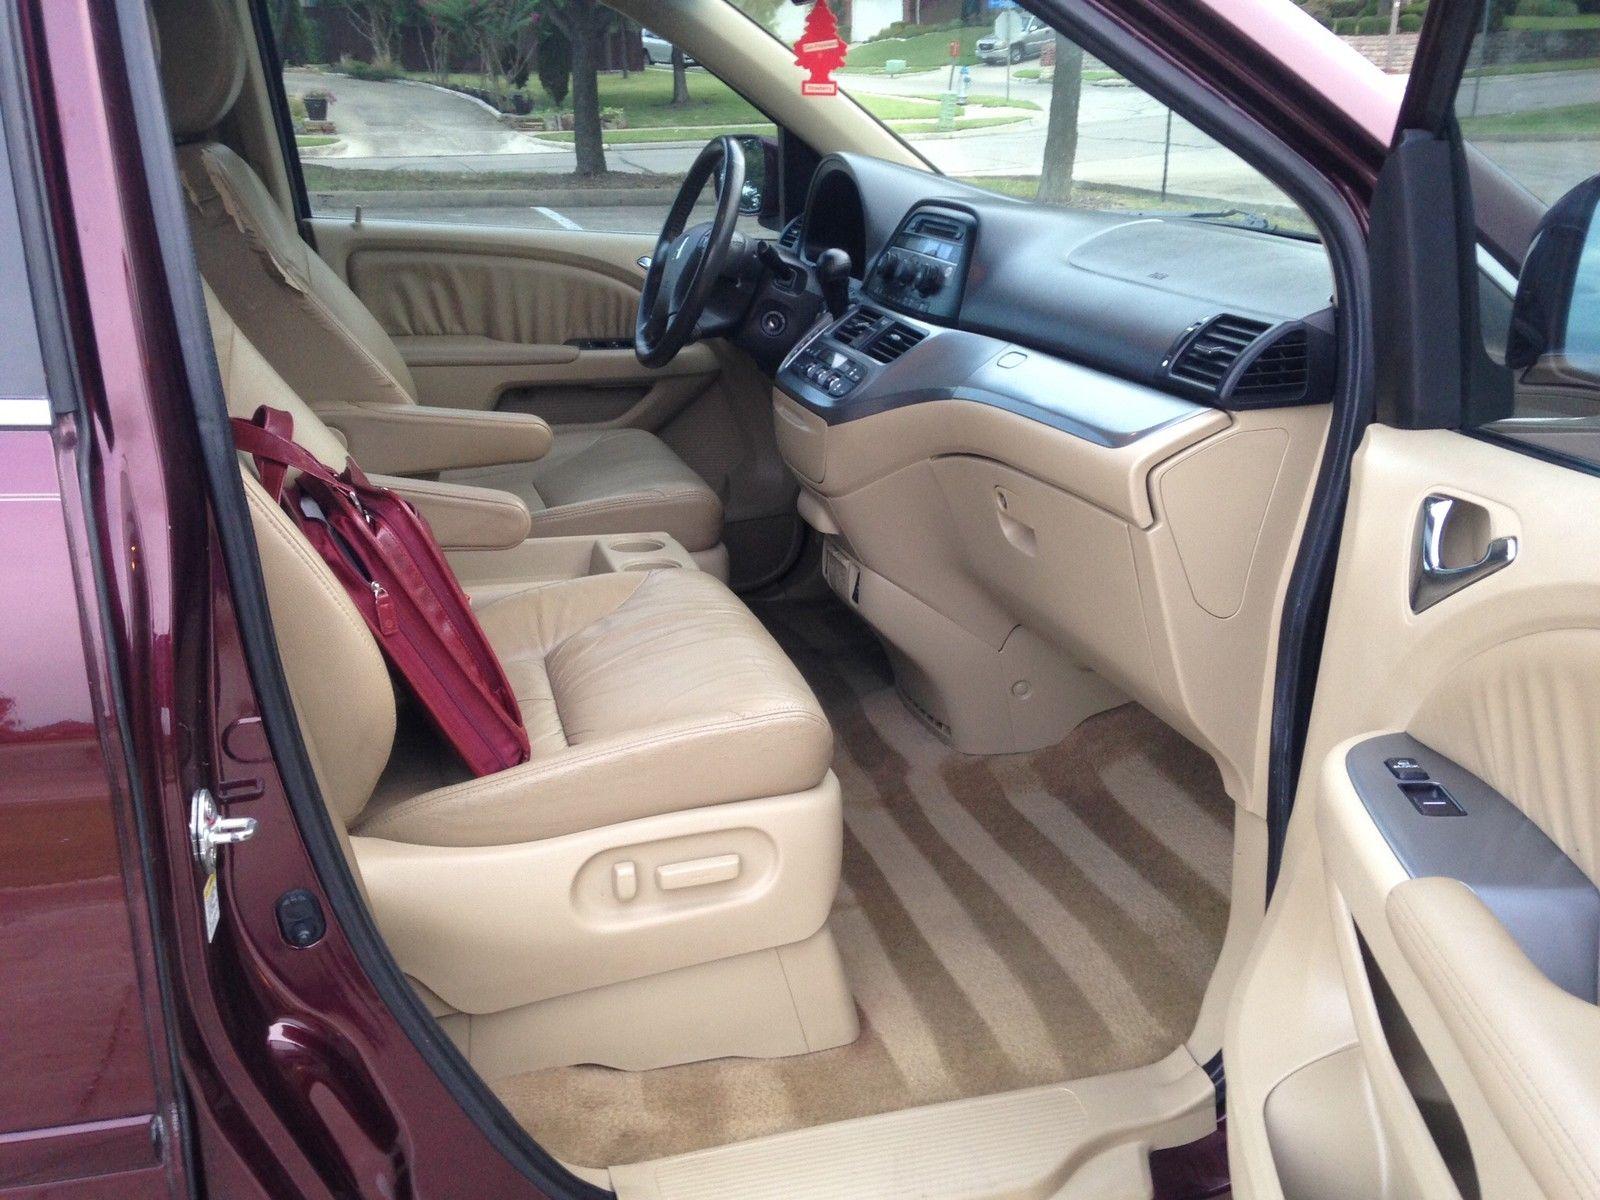 2008 Honda Odyssey EX-L  $1,500 Firm